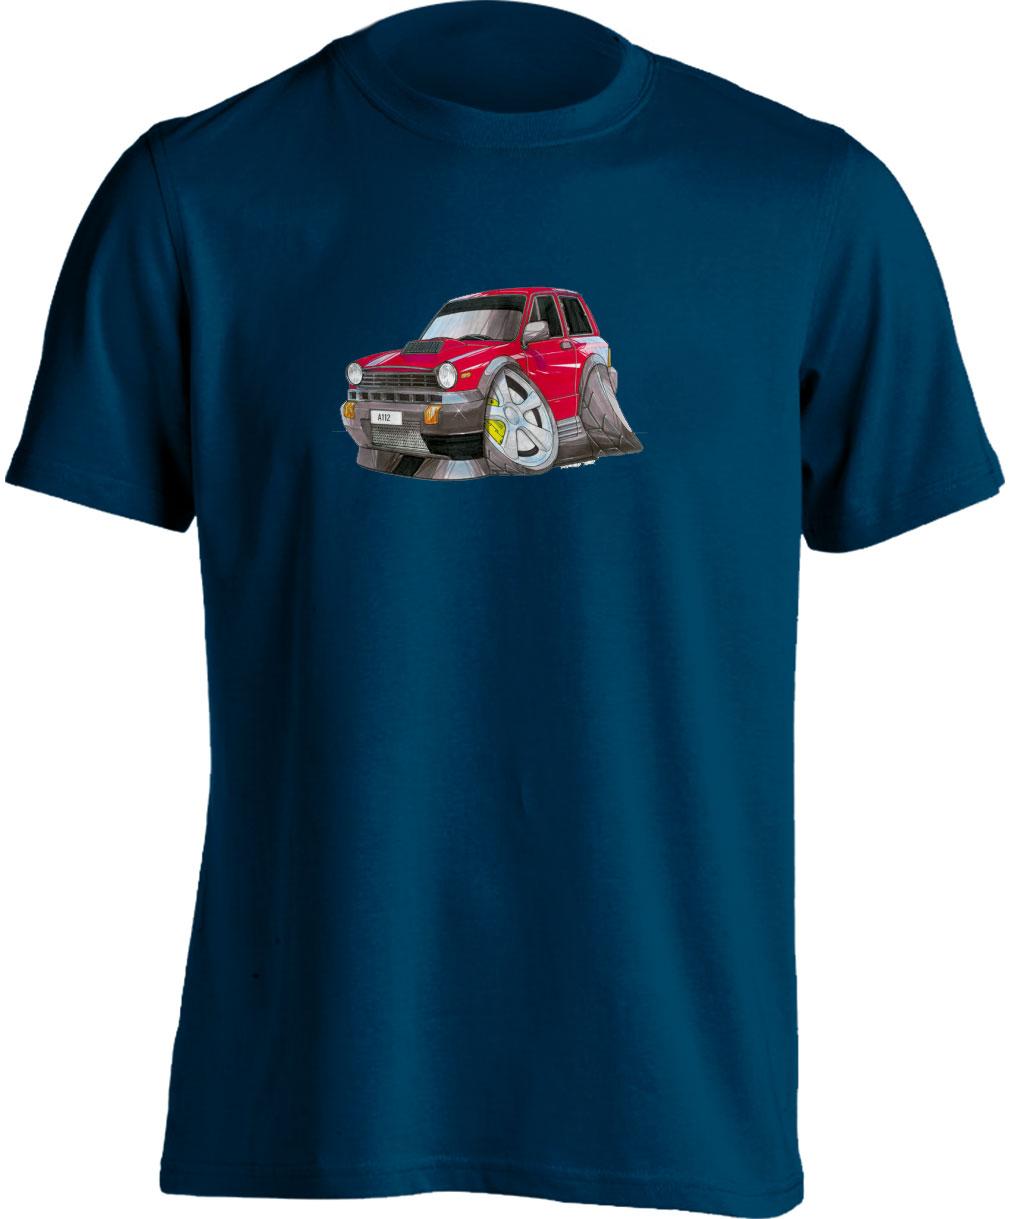 Koolart Abarth A112 Red–1437 Child's T Shirt